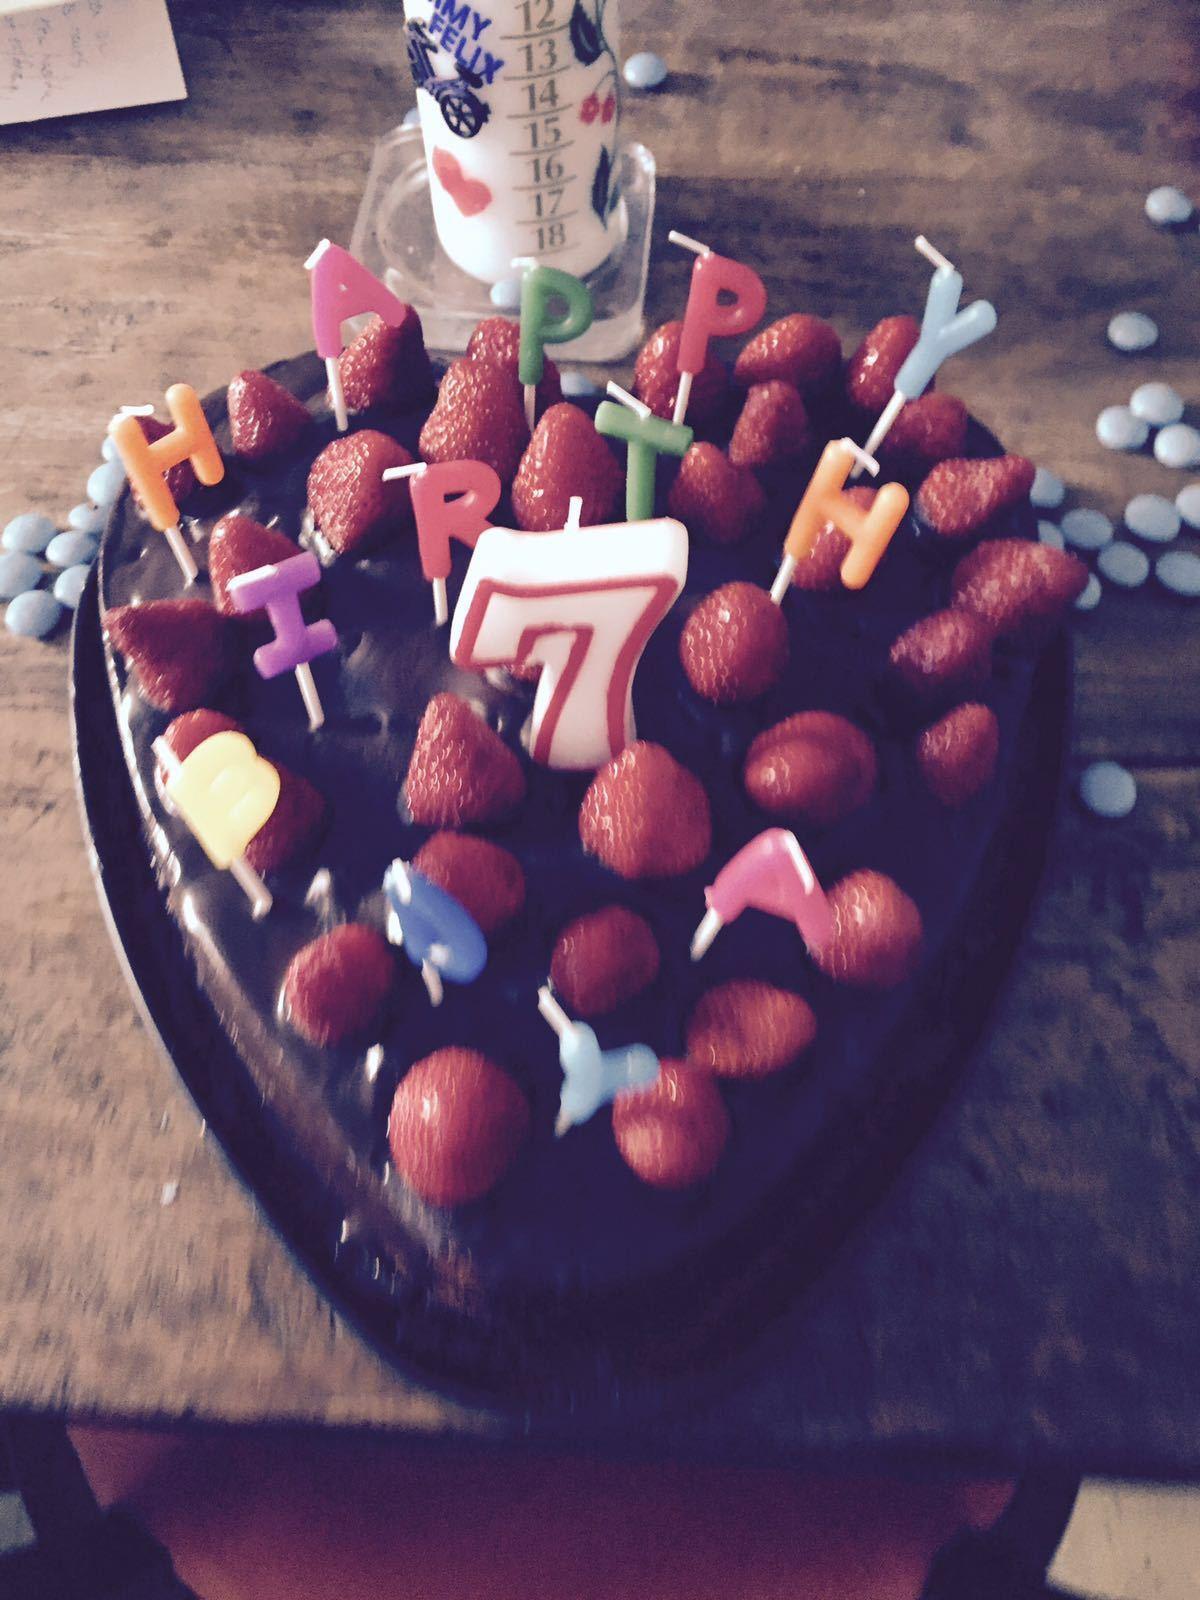 Homemade Chocolate Cake AllrecipesPhoto